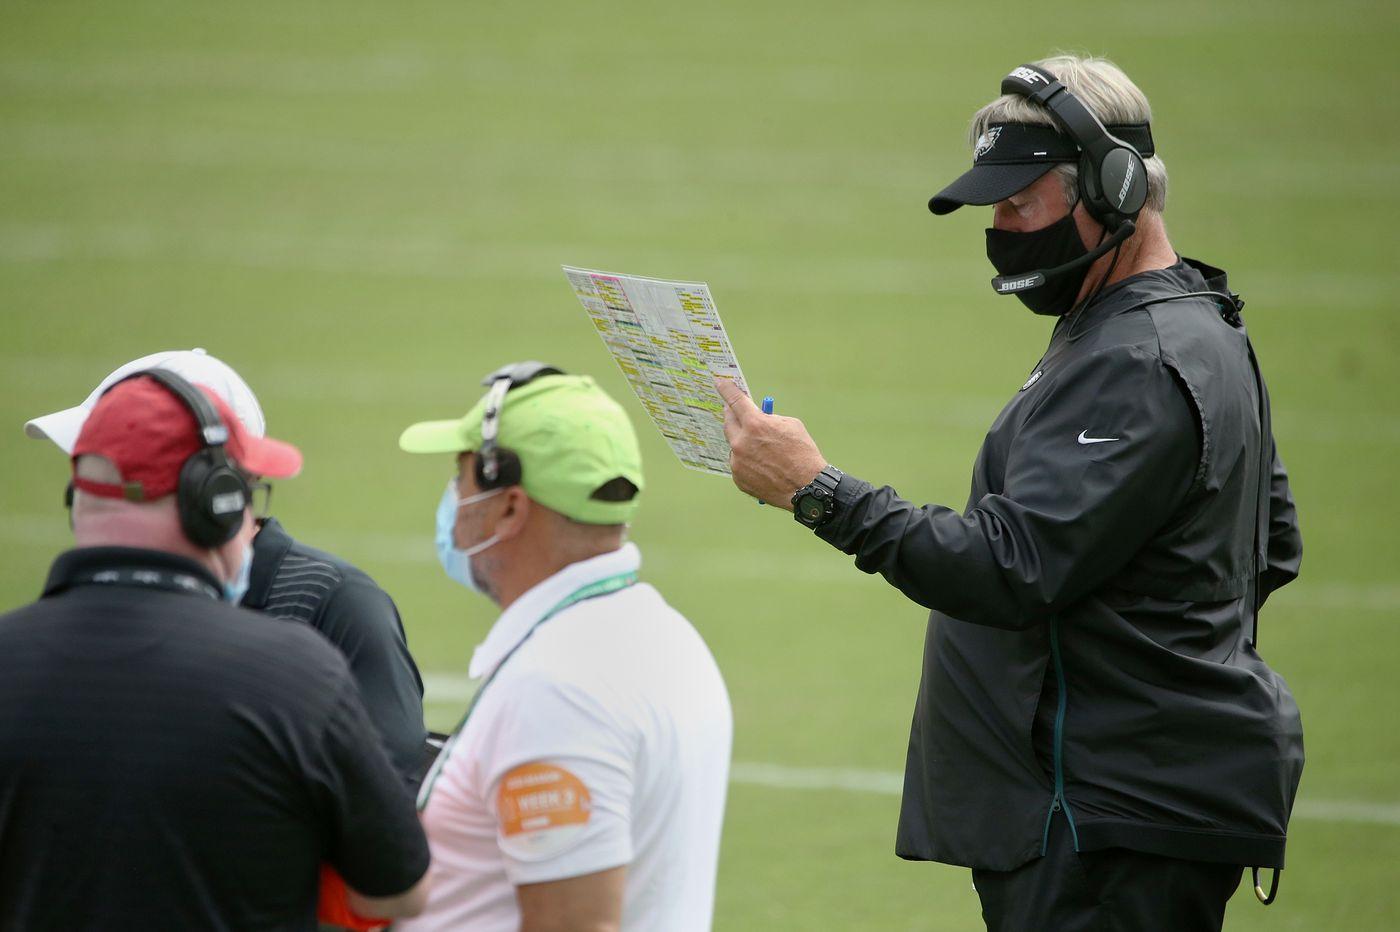 Missing: Eagles coach Doug Pederson | Marcus Hayes